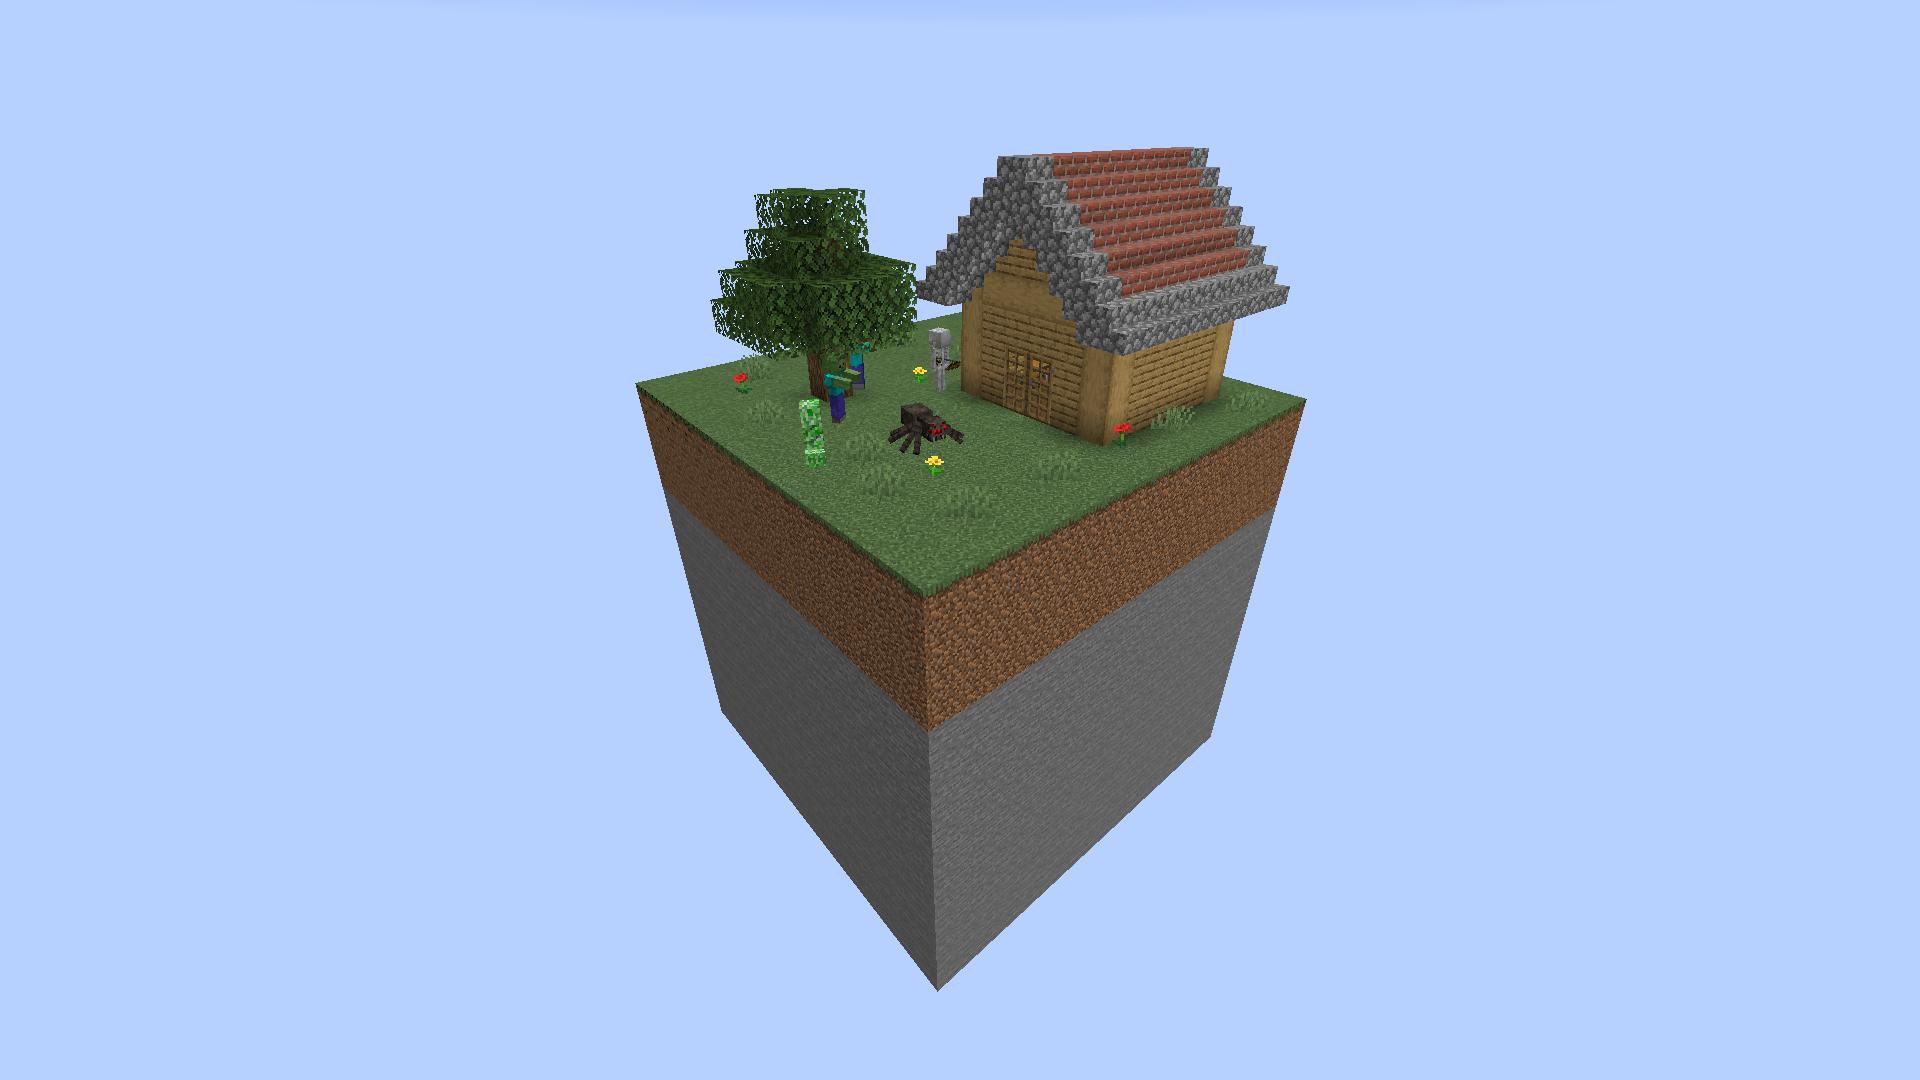 Baixar «Chunk Defense» (9 mb) mapa para Minecraft